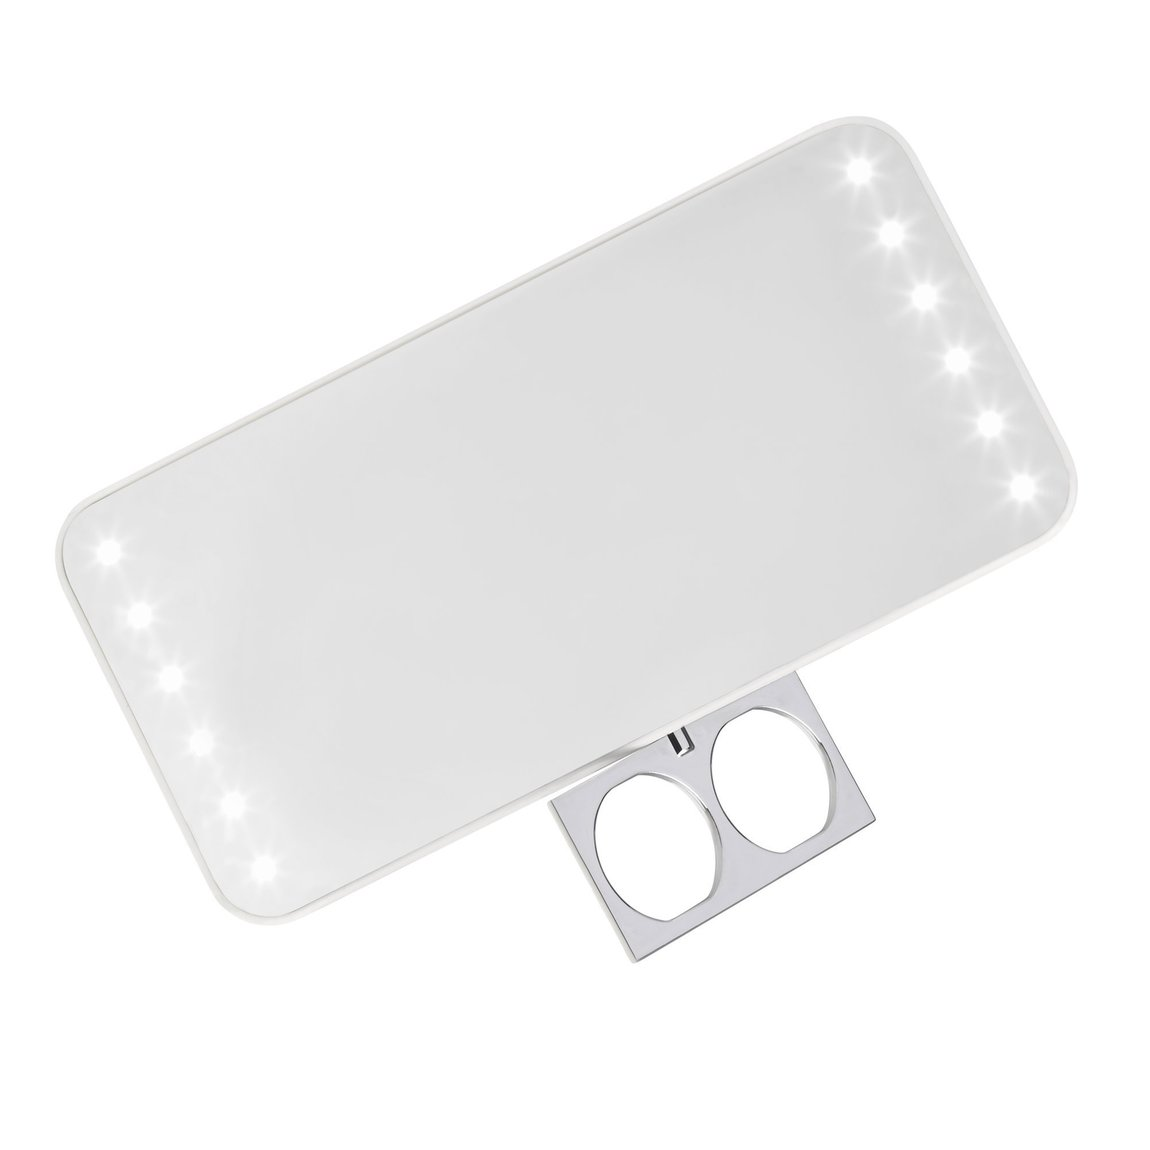 Glamcor Riki Cutie Vanity Mirror White